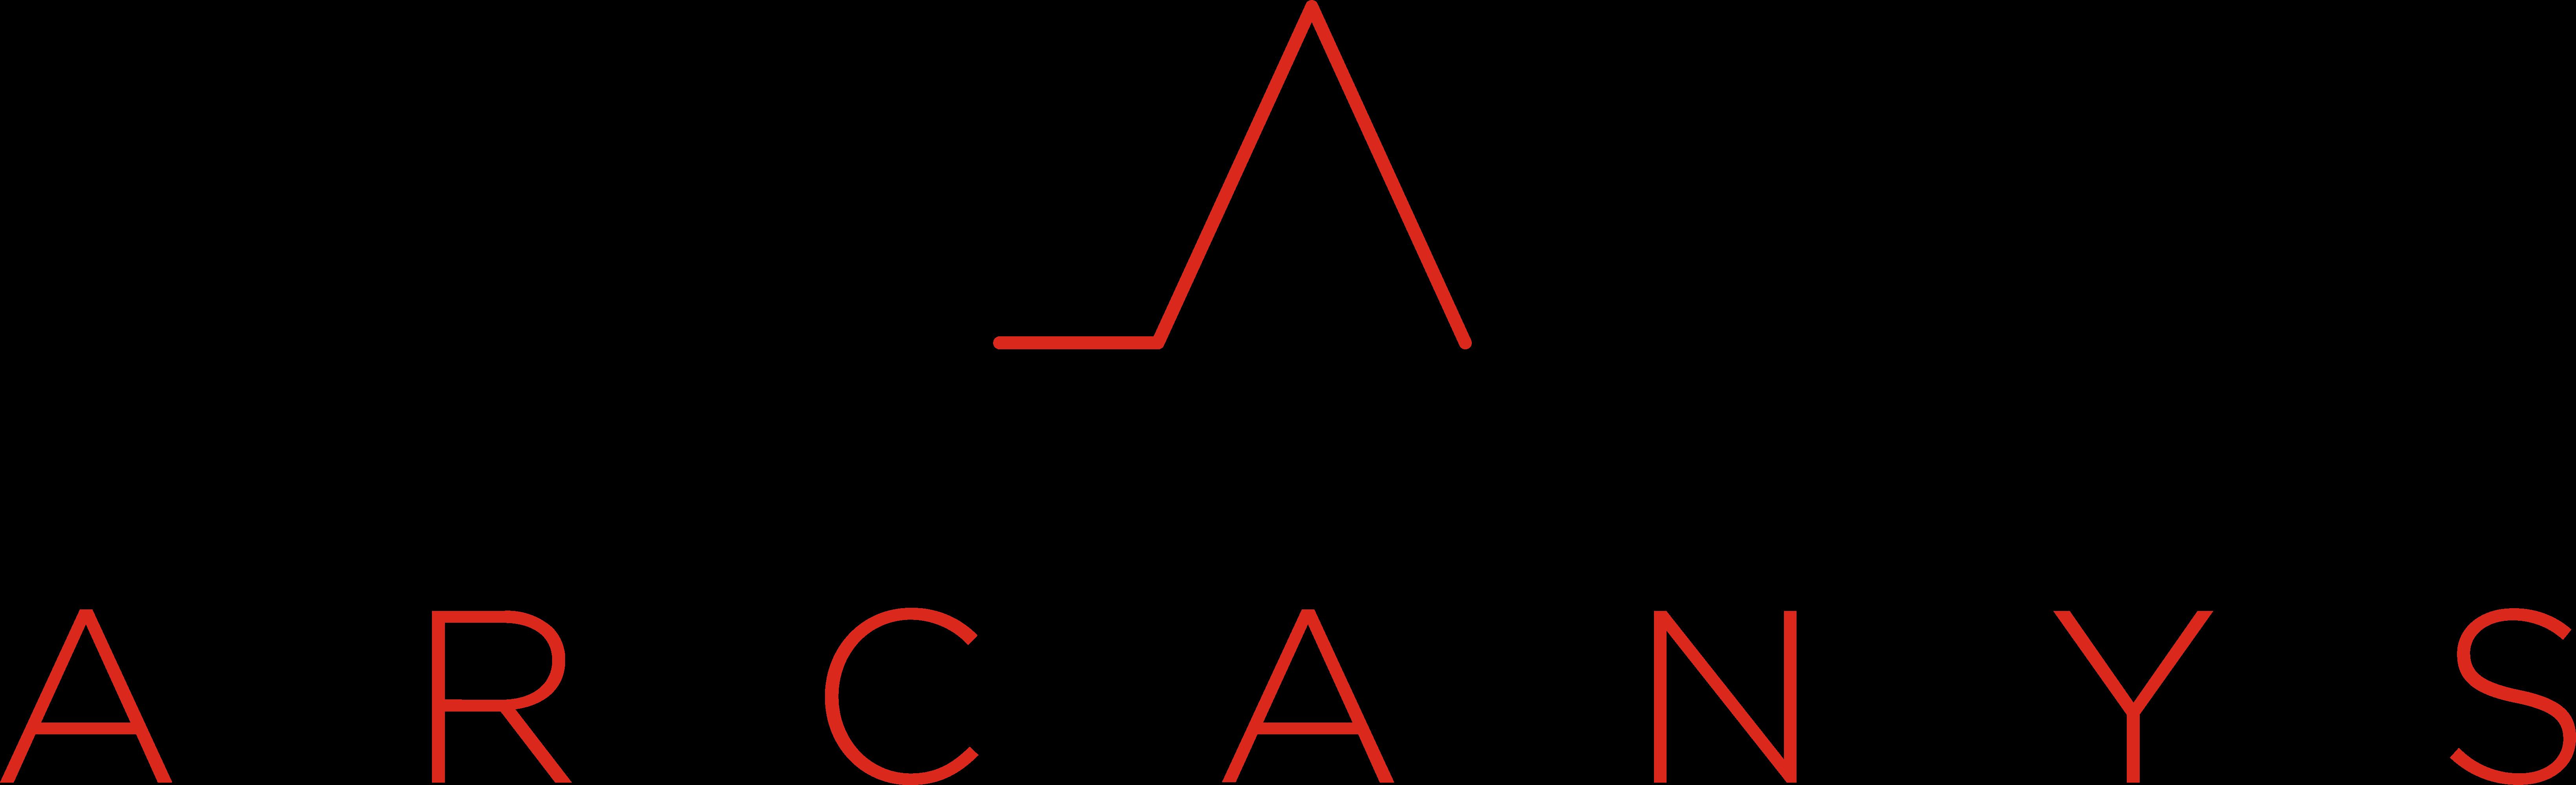 Arcanys Inc